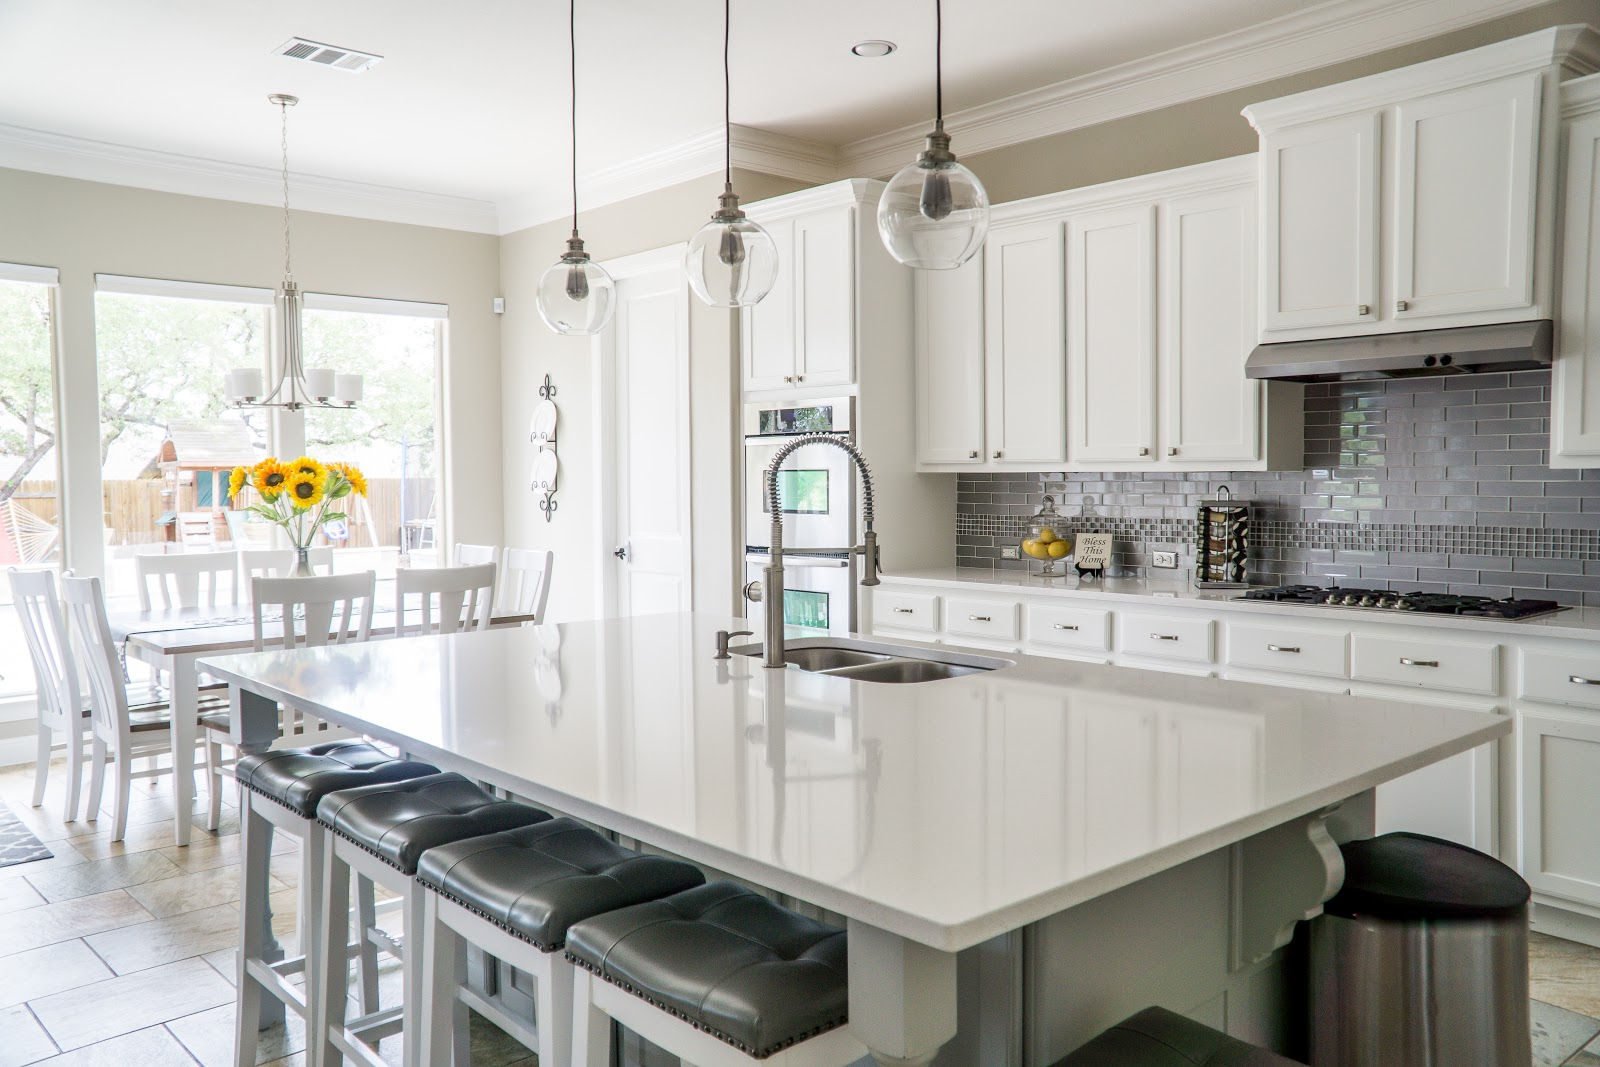 top 5 reasons to build a custom home, hagen homes, custom home builder in kenosha county